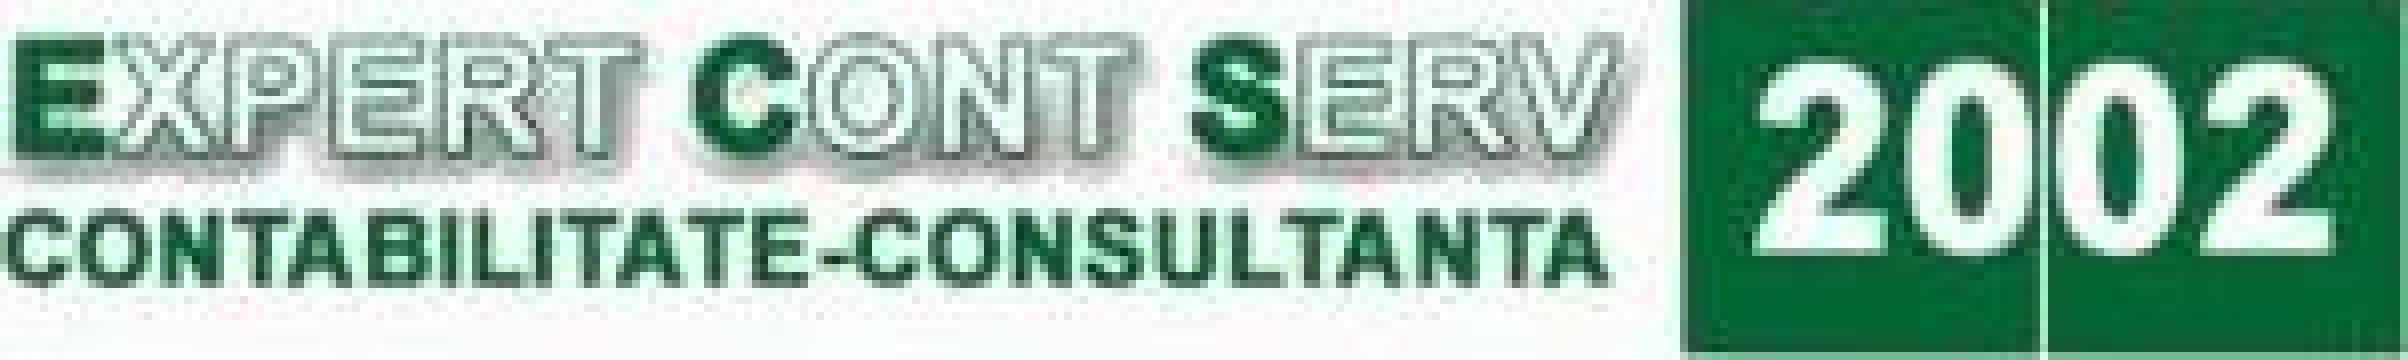 Consultanta privind evidenta personalului de la Expert Cont Serv 2002